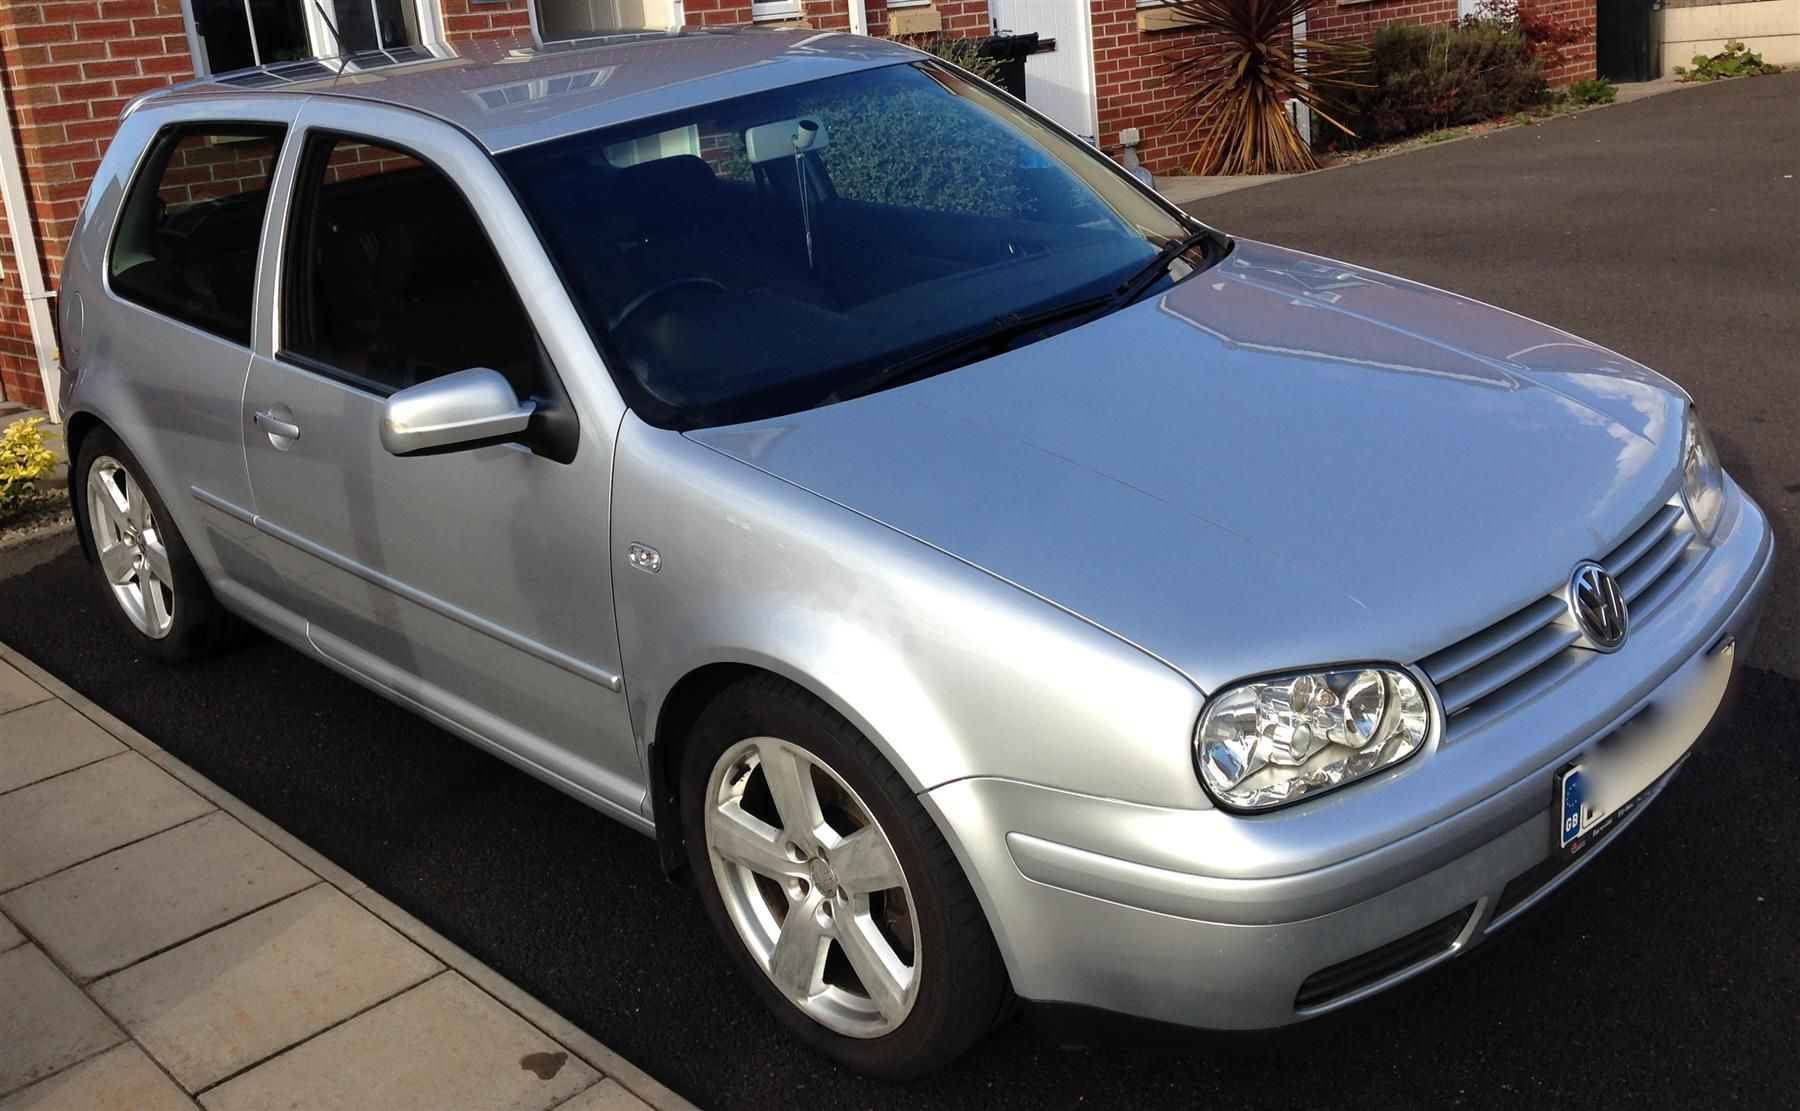 se golf volkswagen hertfordshire for plus sale in radlett tdi car infinity used